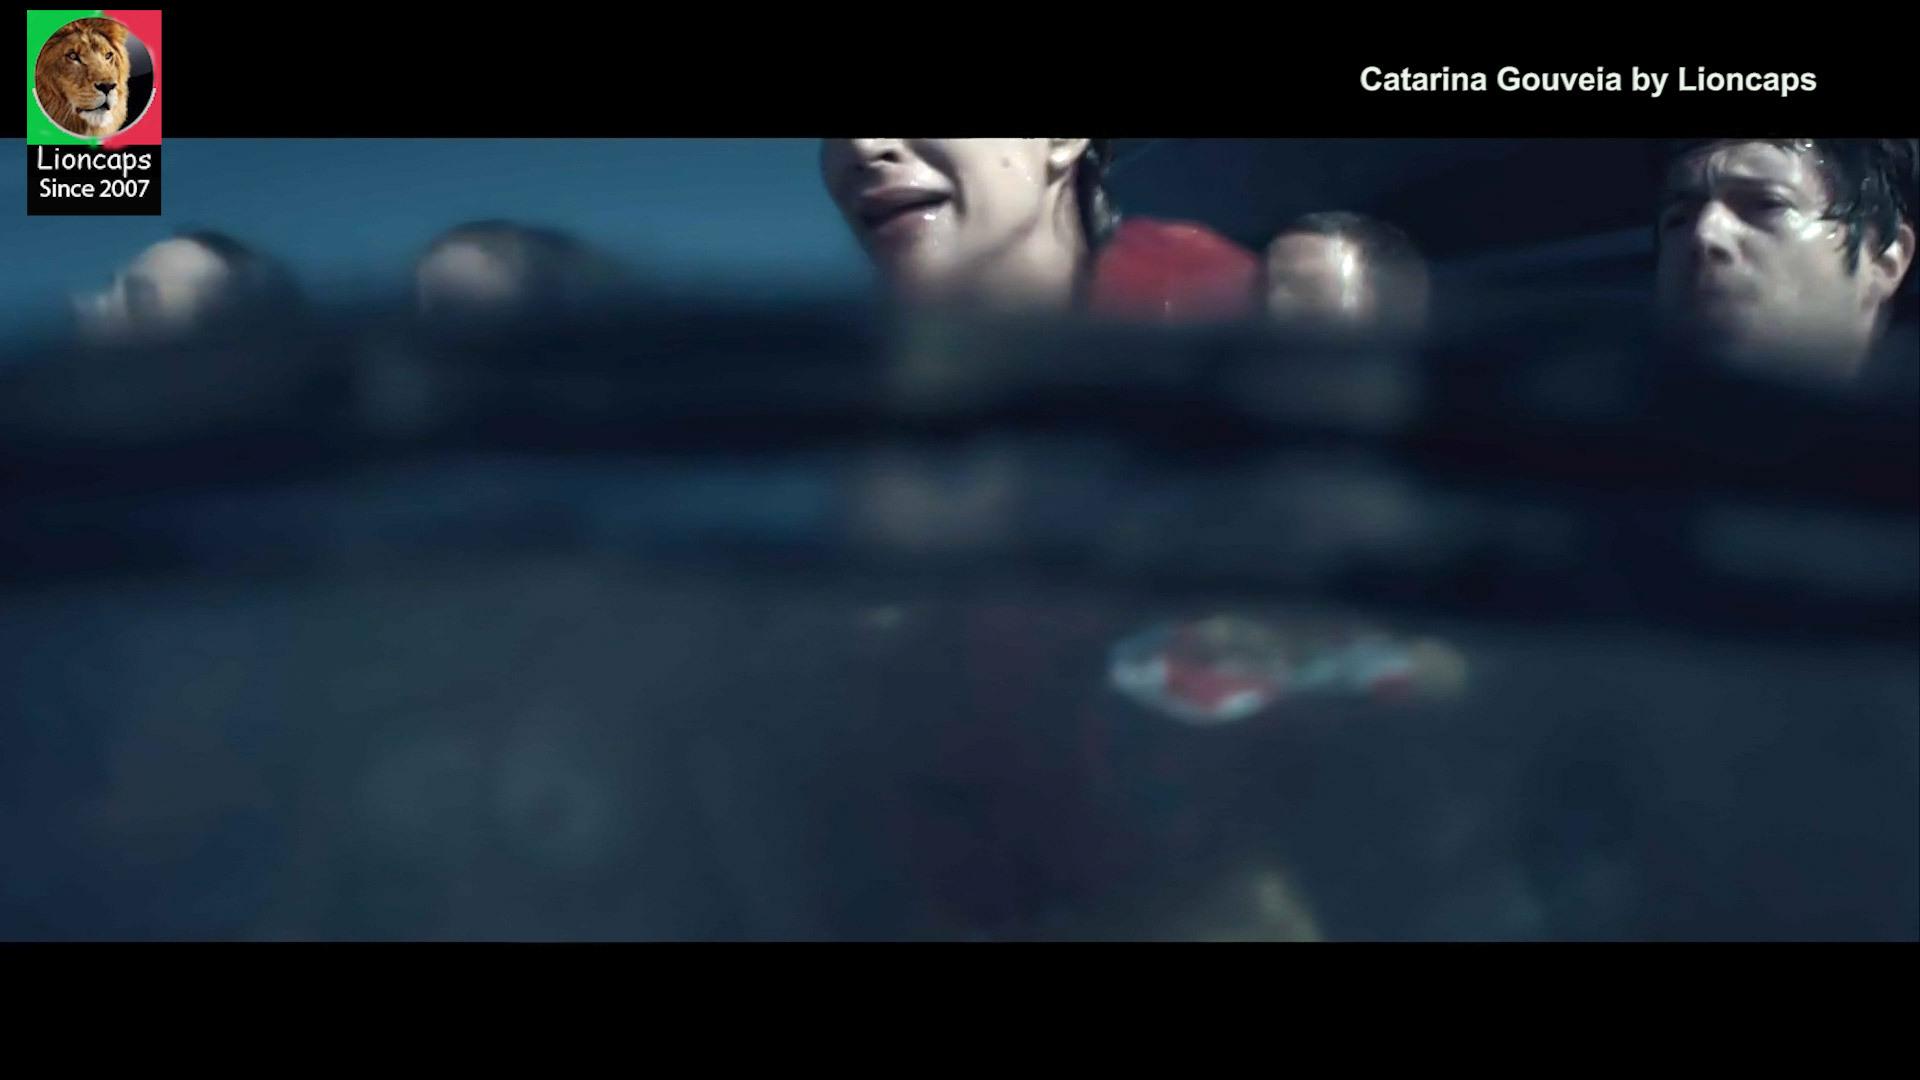 catarina_gouveia_perdidos_lioncaps_09_05_2021_07 (14).jpg